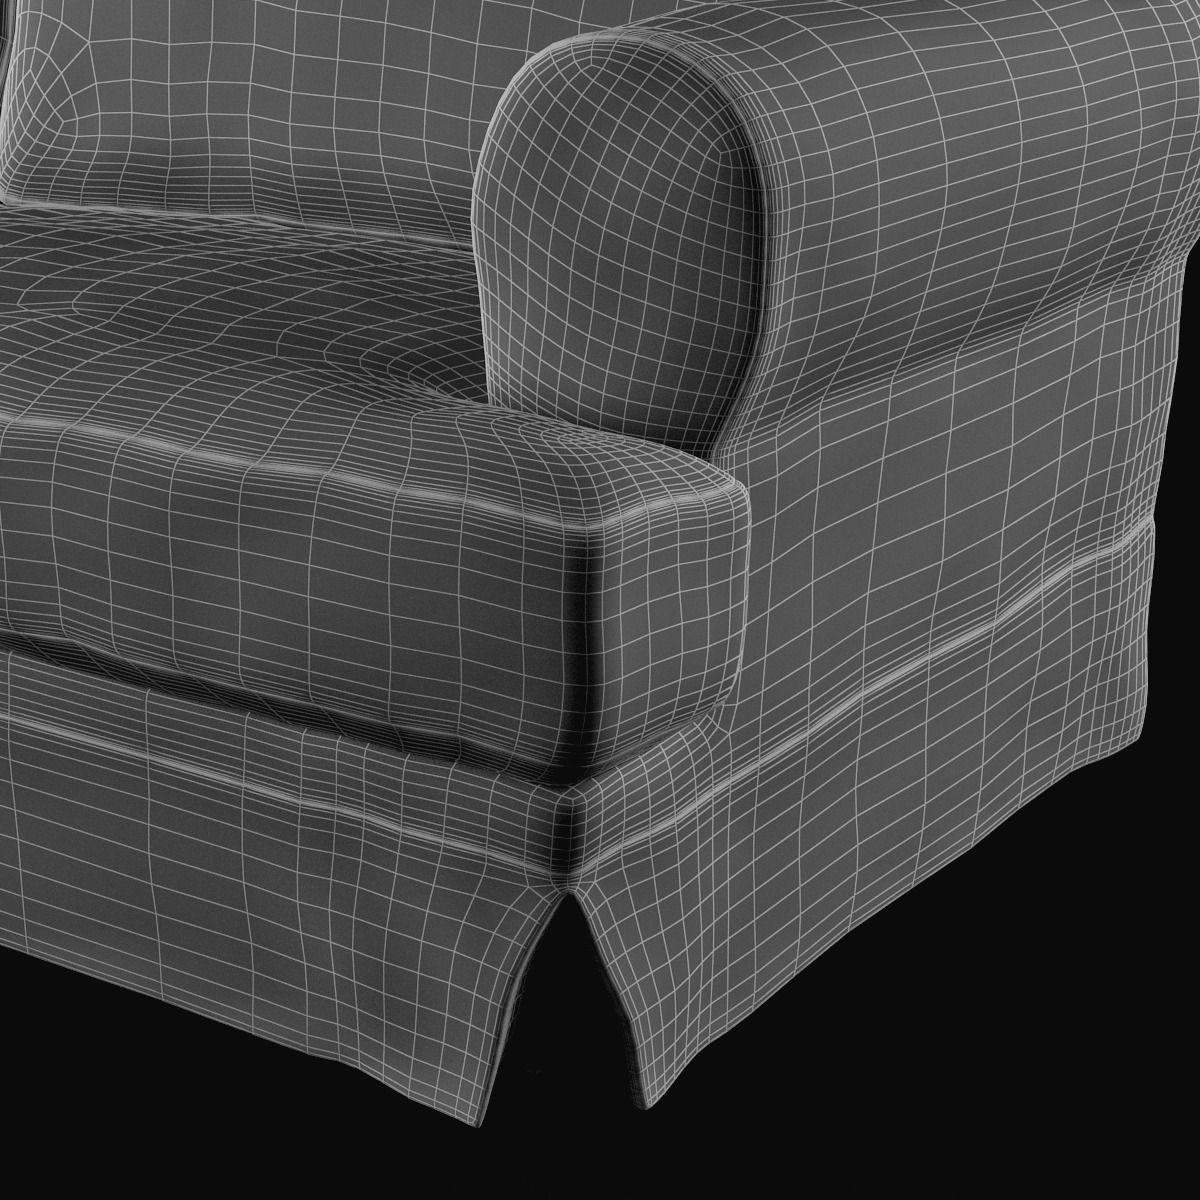 ikea ekeskog sofa for sale designer leather corner sofas uk 3d model max cgtrader